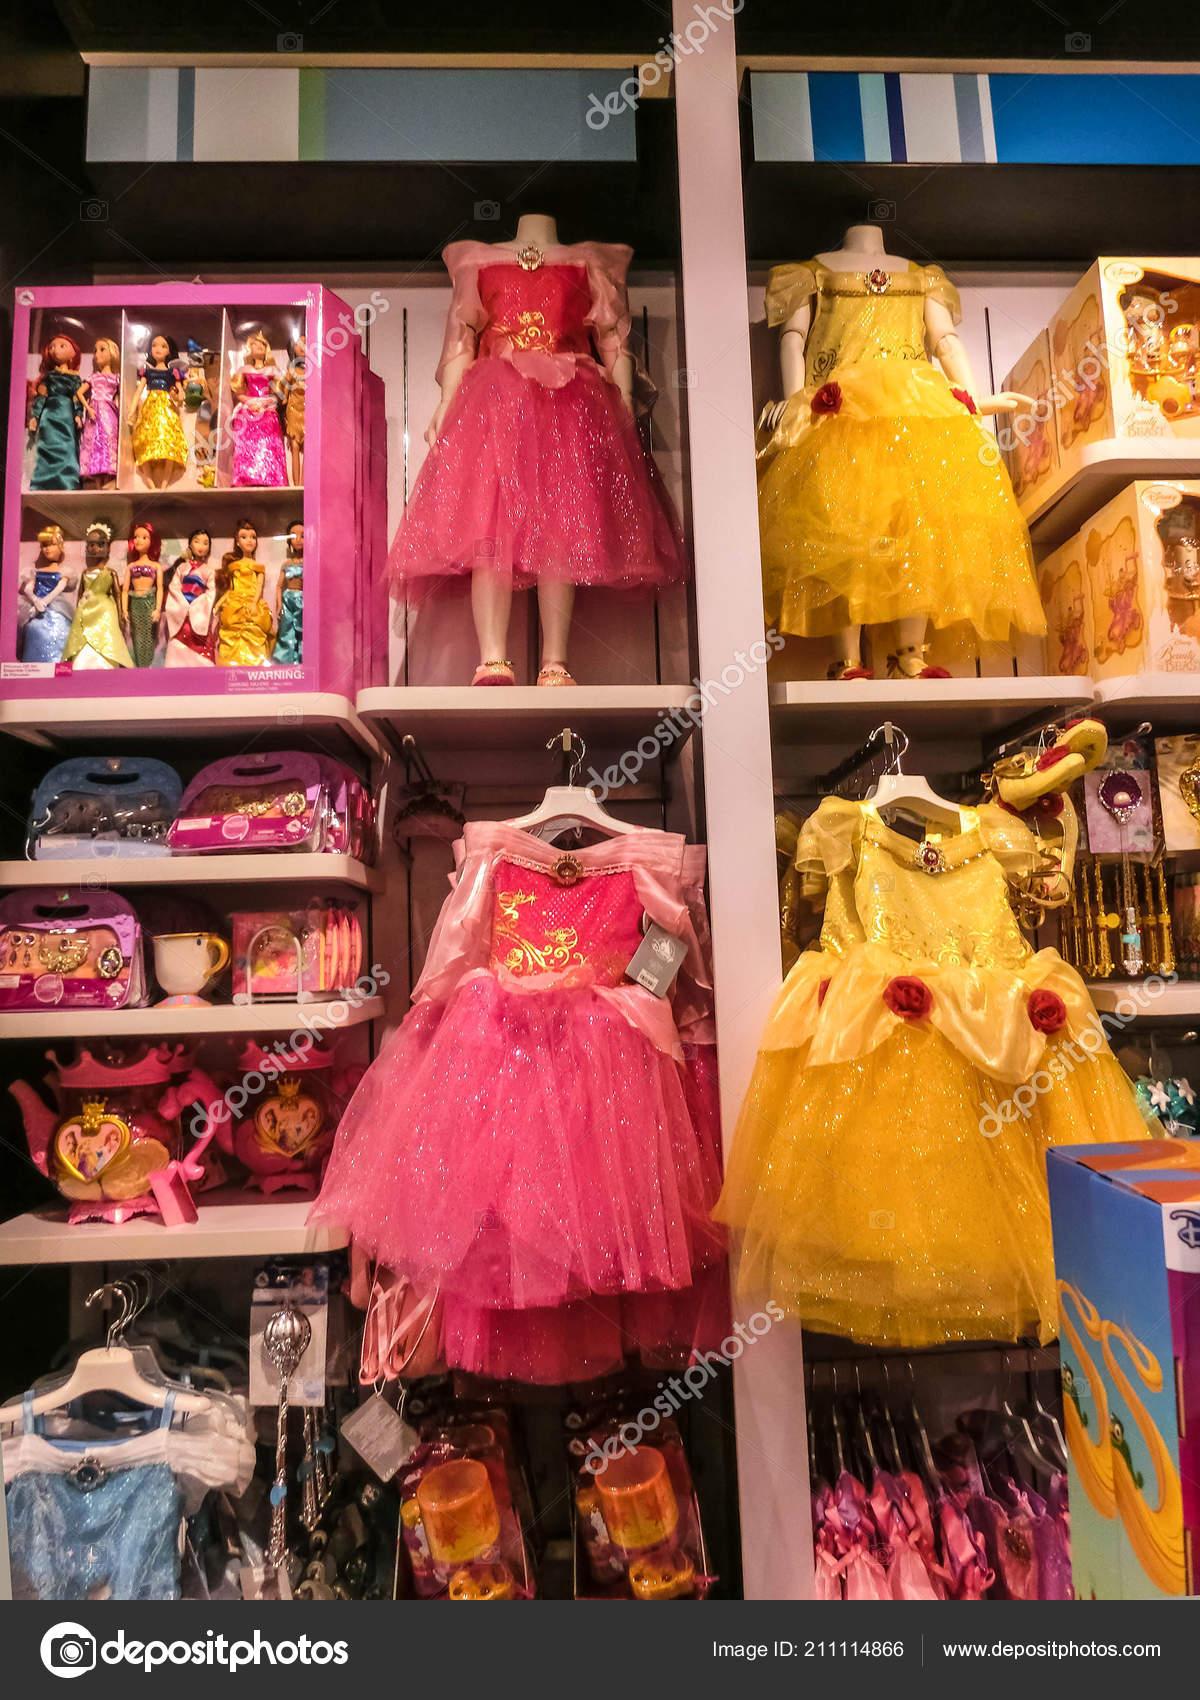 188e8ef1309 Ορλάντο, ΗΠΑ - 10 Μαΐου 2018: Το πολύχρωμο πριγκίπισσα στο Disney store  εσωτερική εμπορικό